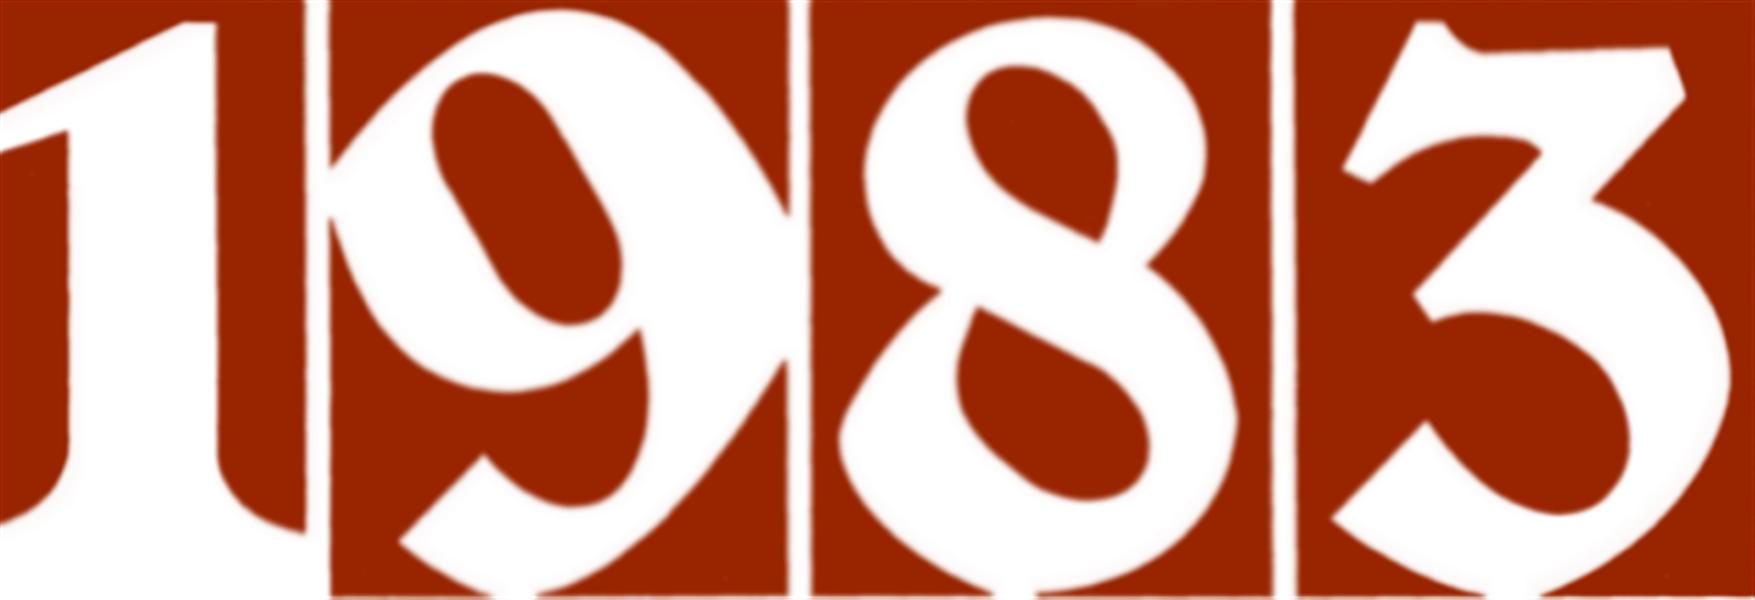 244ffd41-aca4-46b7-b193-d655dbf29ecb_1983.png